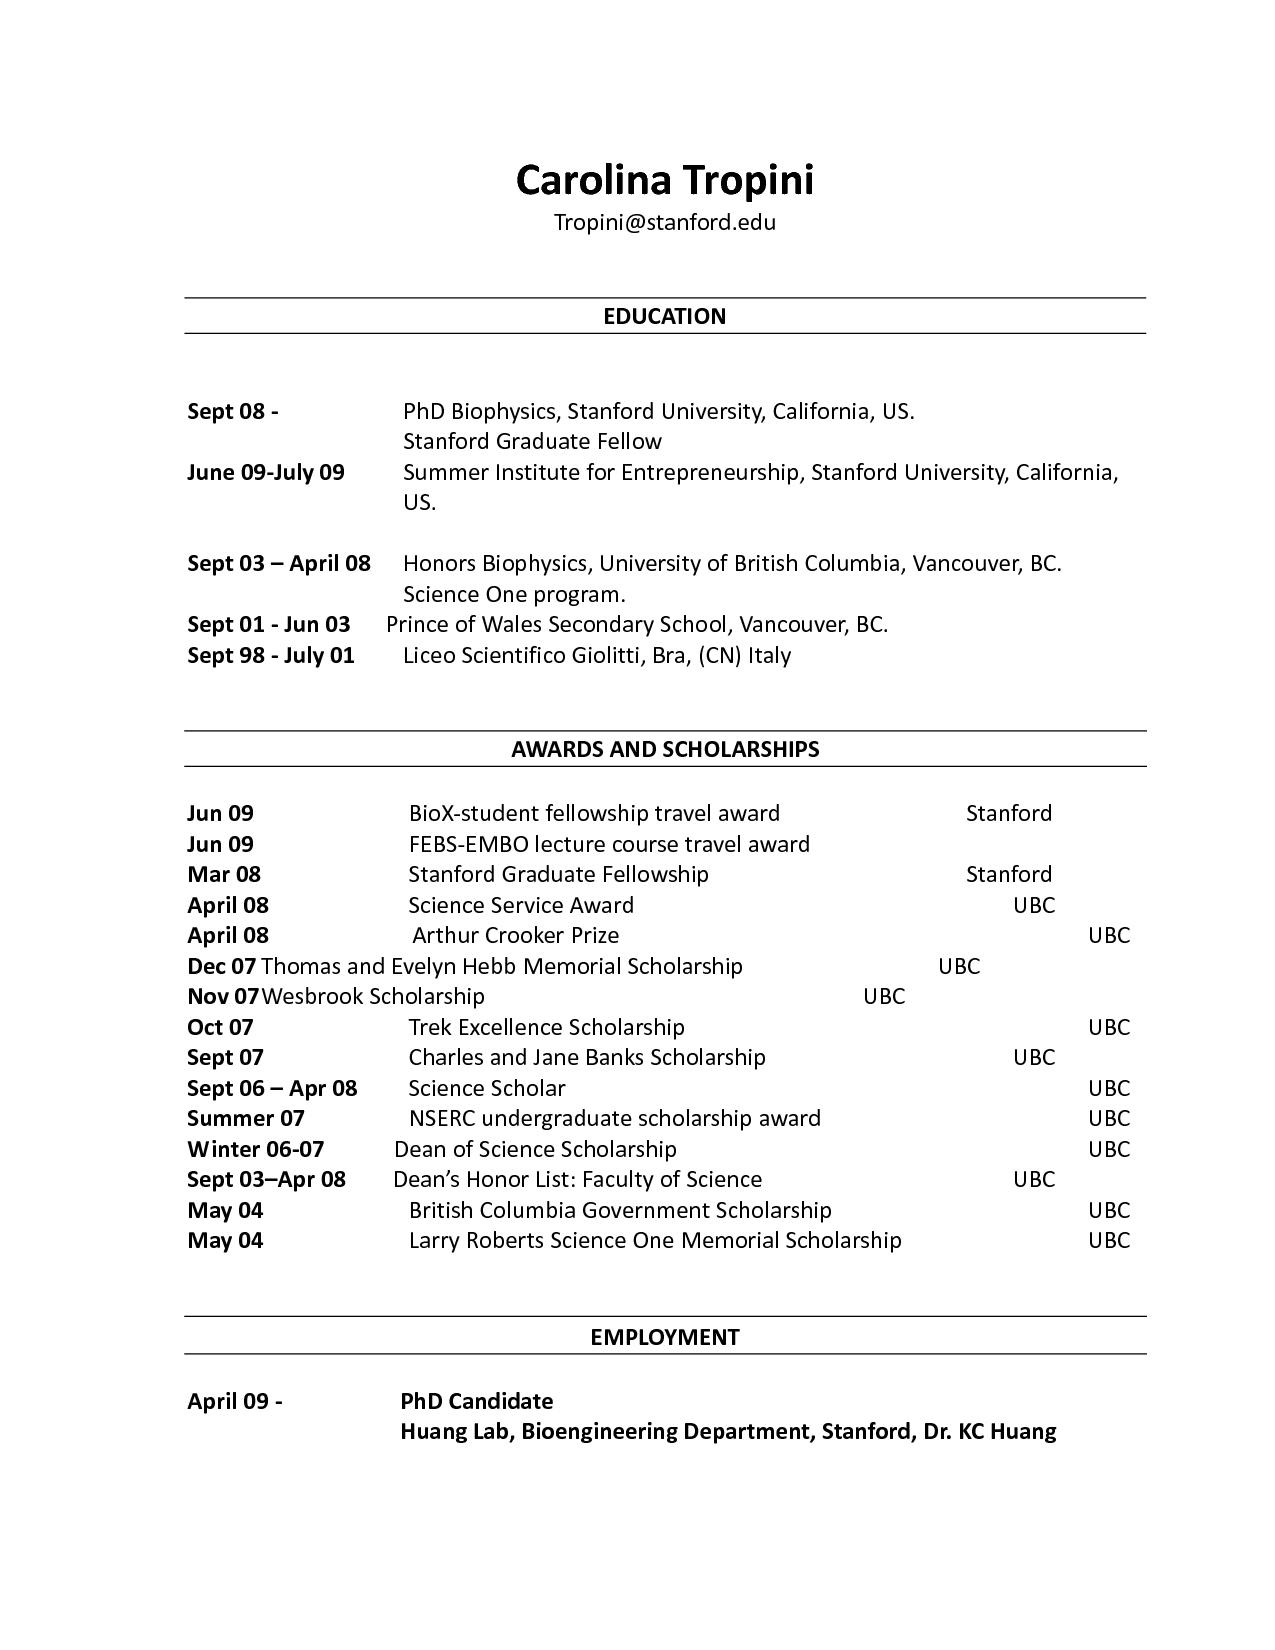 Resume Format Header Resume format, Resume, Resume templates